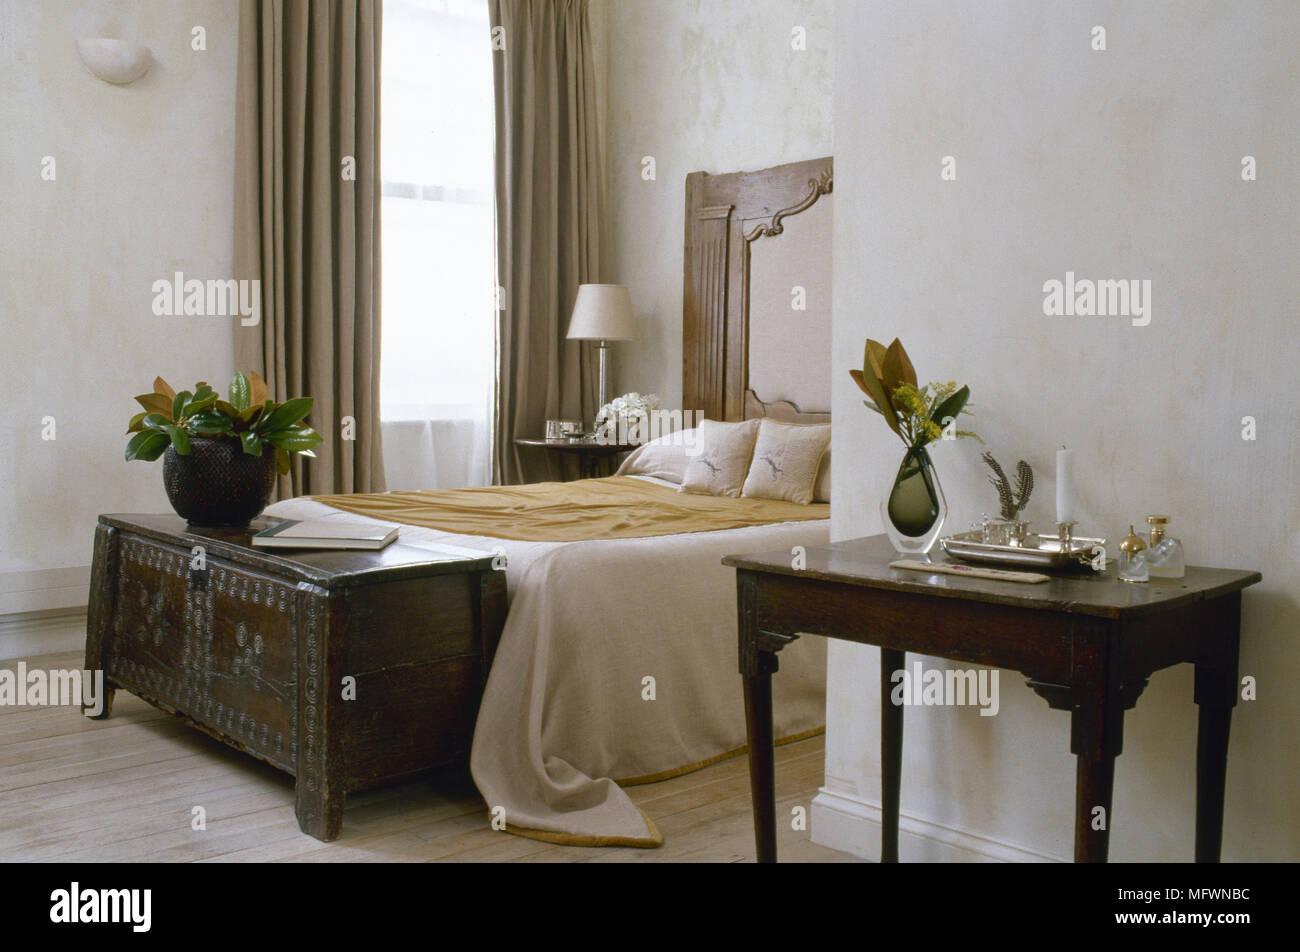 Curtained Window Stockfotos & Curtained Window Bilder - Alamy